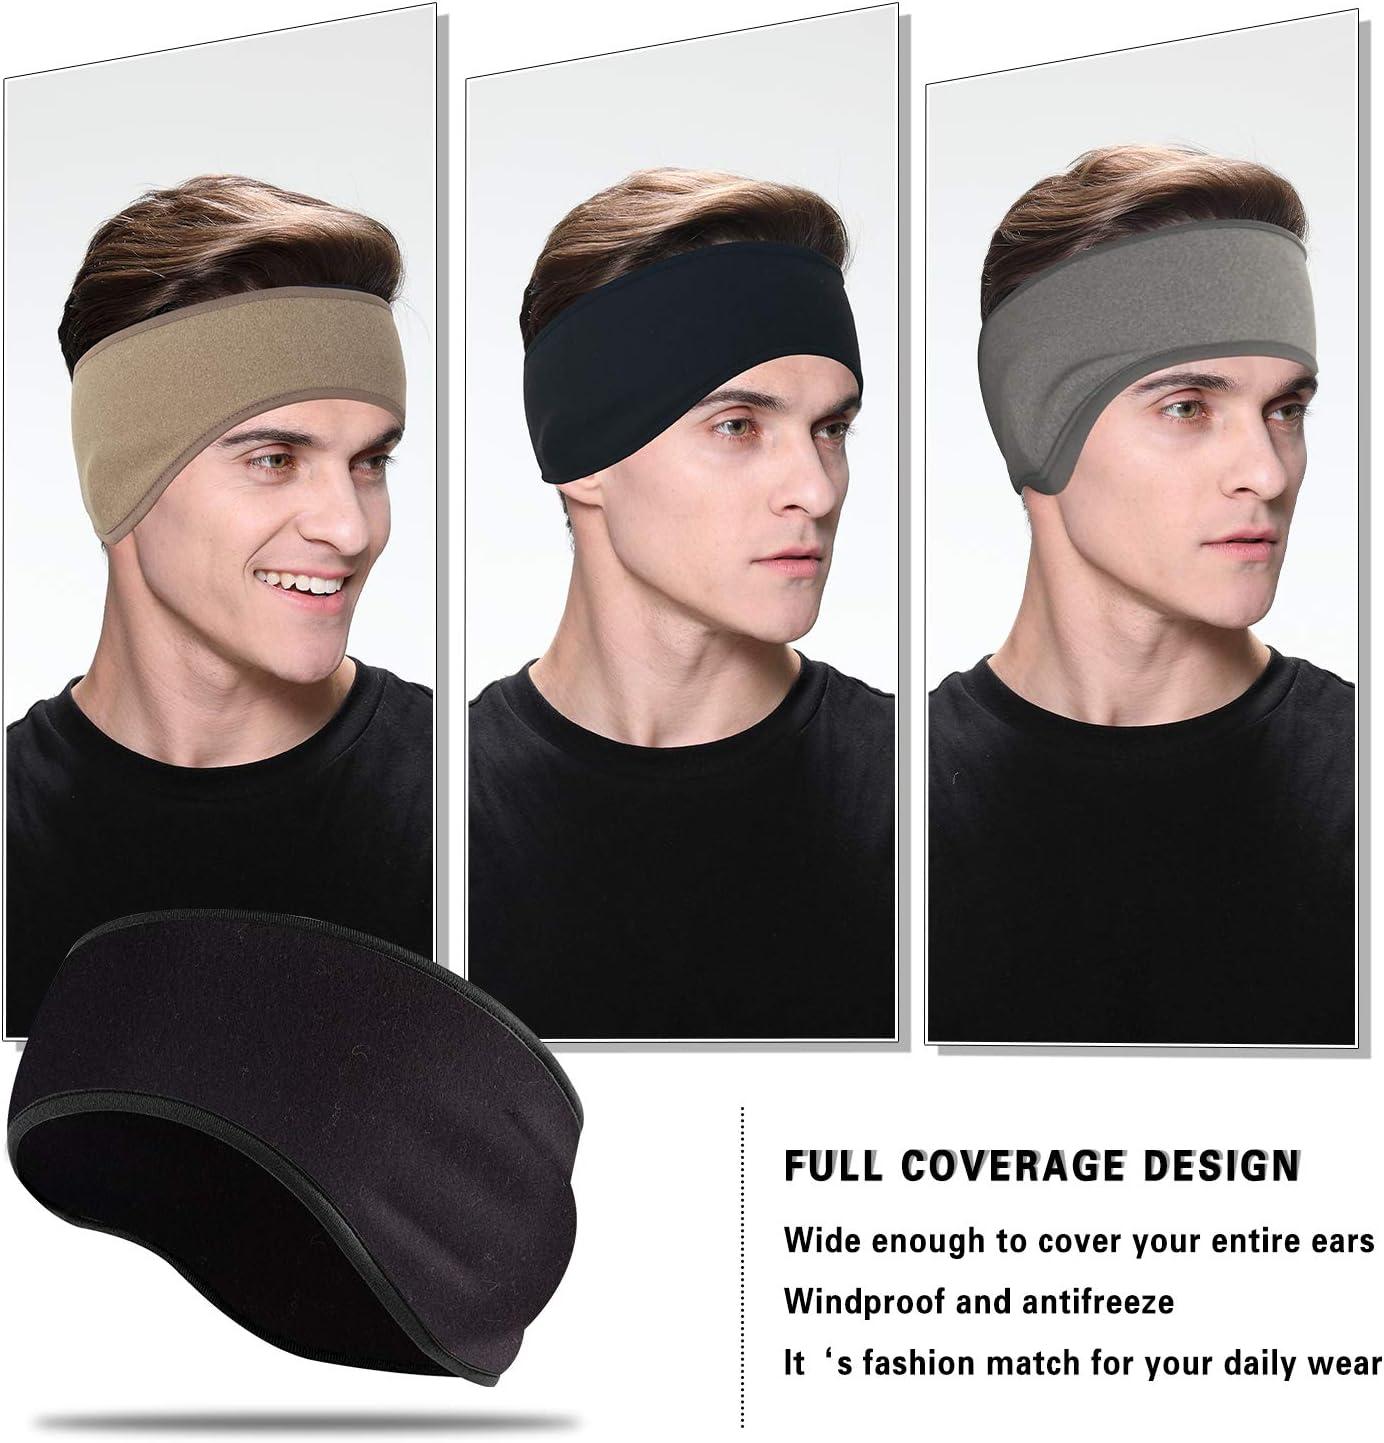 Women/&Men Daily Wear Cycing Winter Ear Warmer Headband for Running Racing Working Out EasYoung Ear Warmers Headbands for Winter Skiing 3//2 Pack Cold Weather Keep Warm Ear Headbands